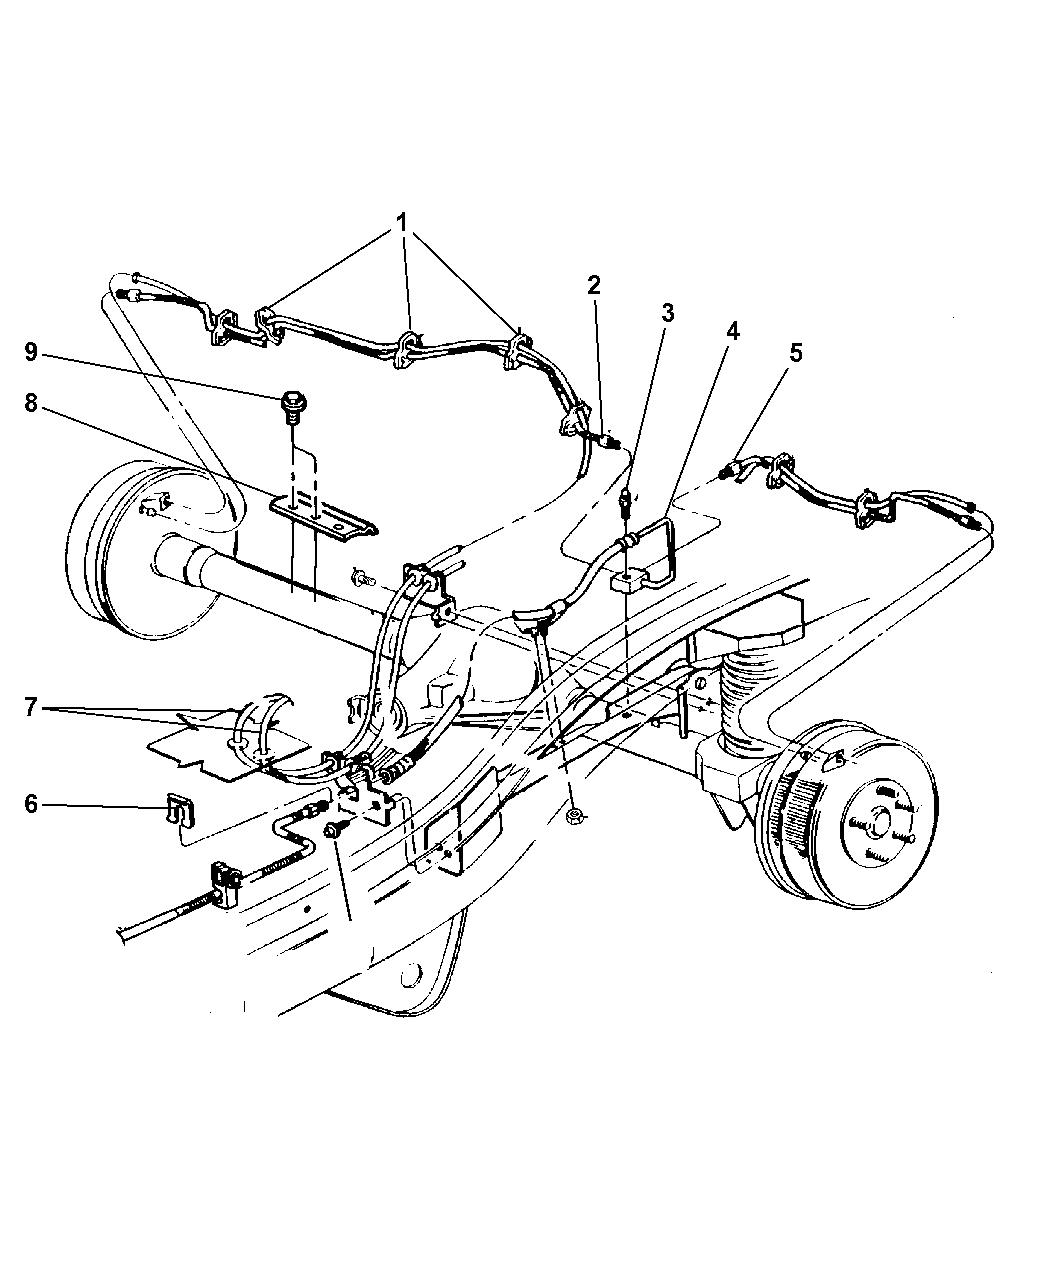 52130025 genuine mopar line brake 1990 Jeep Cherokee Rear Brake Diagram 2001 jeep cherokee brake lines \u0026 hoses, rear